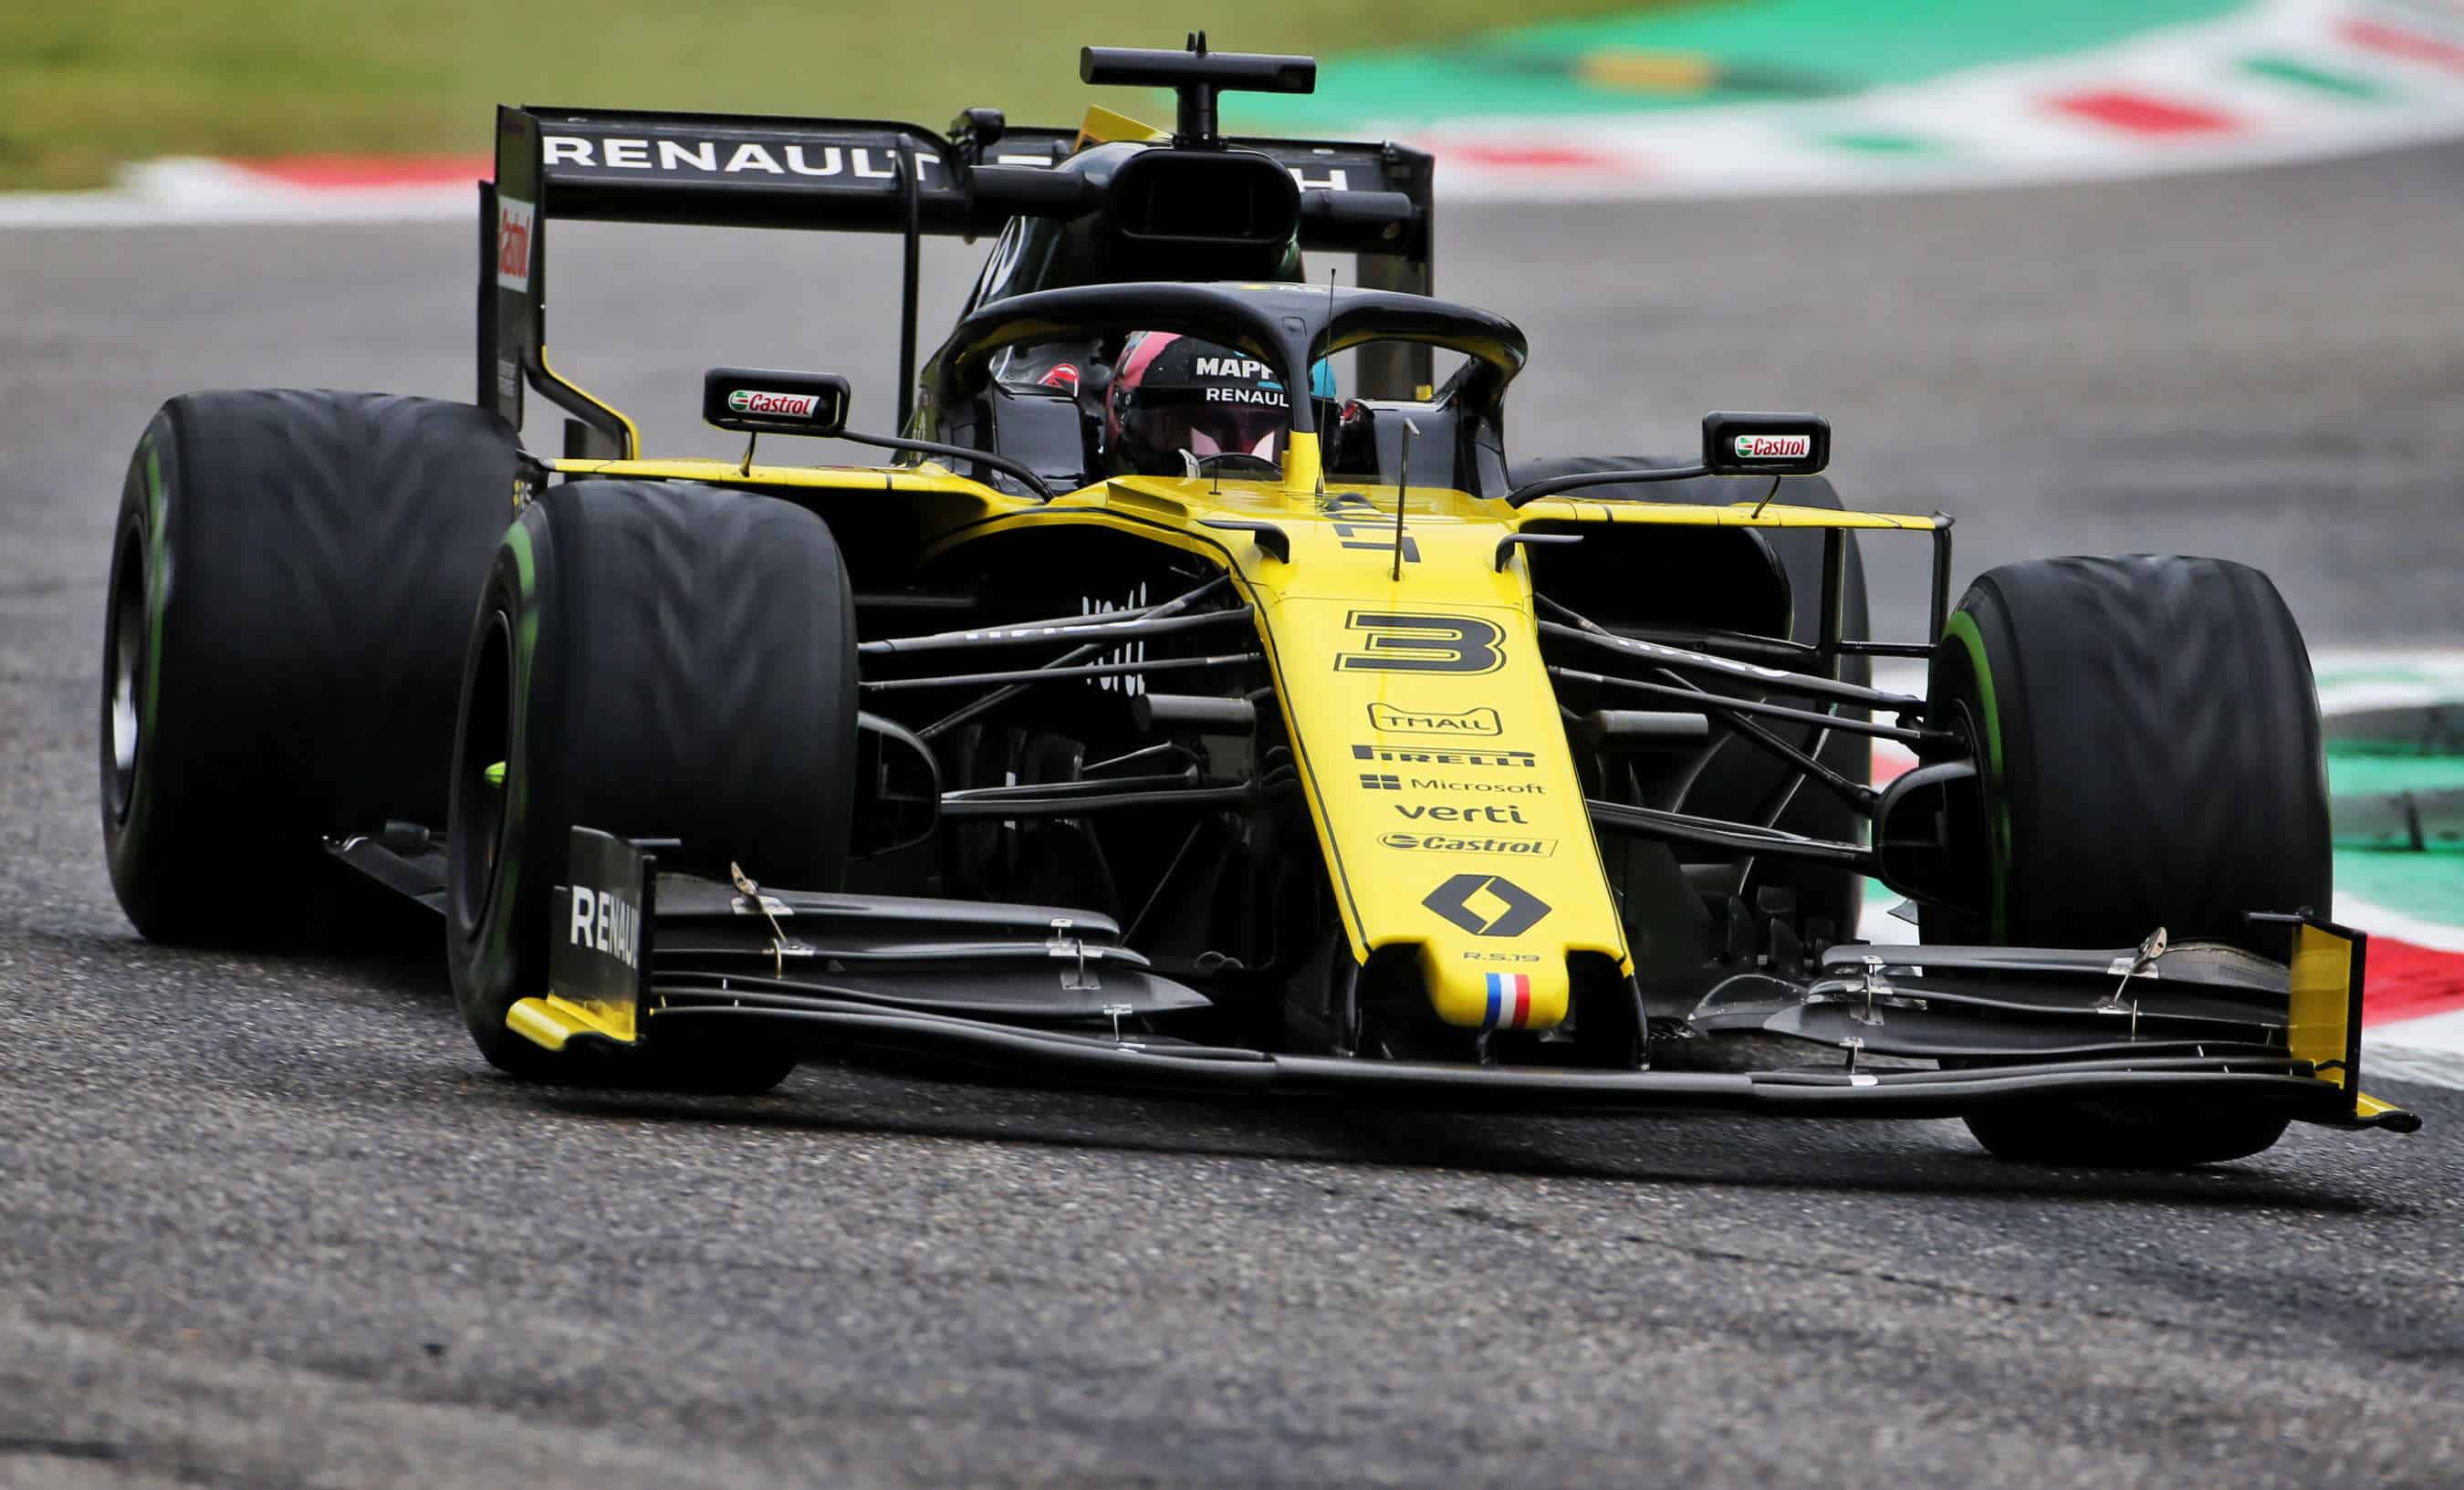 Daniel Ricciardo Renault RS19 Italian GP F1 2019 Photo Renault